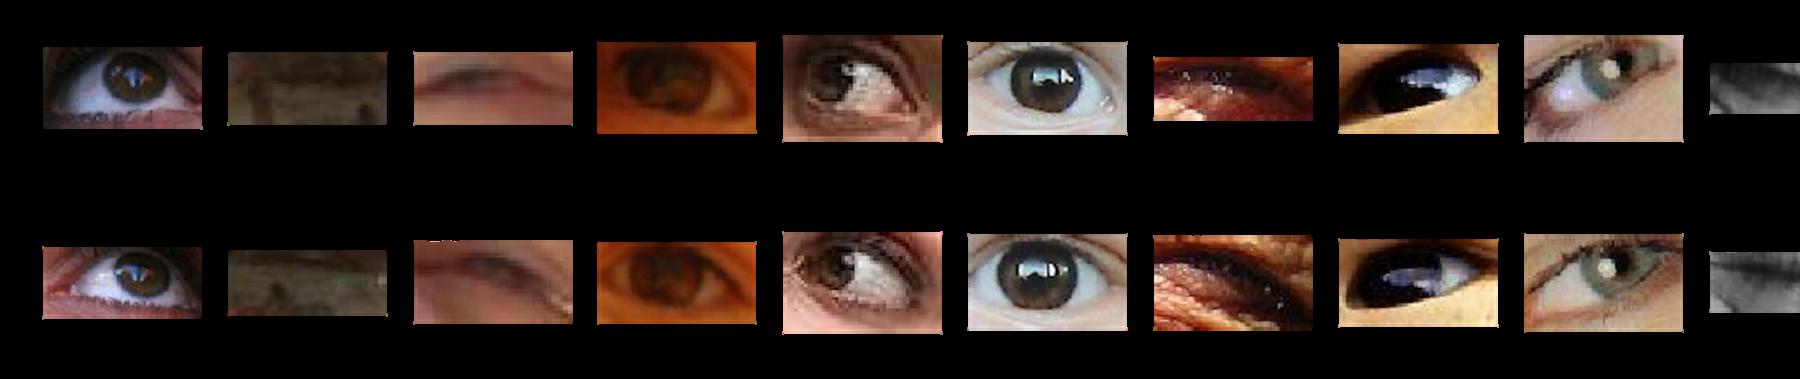 Eye Dataset